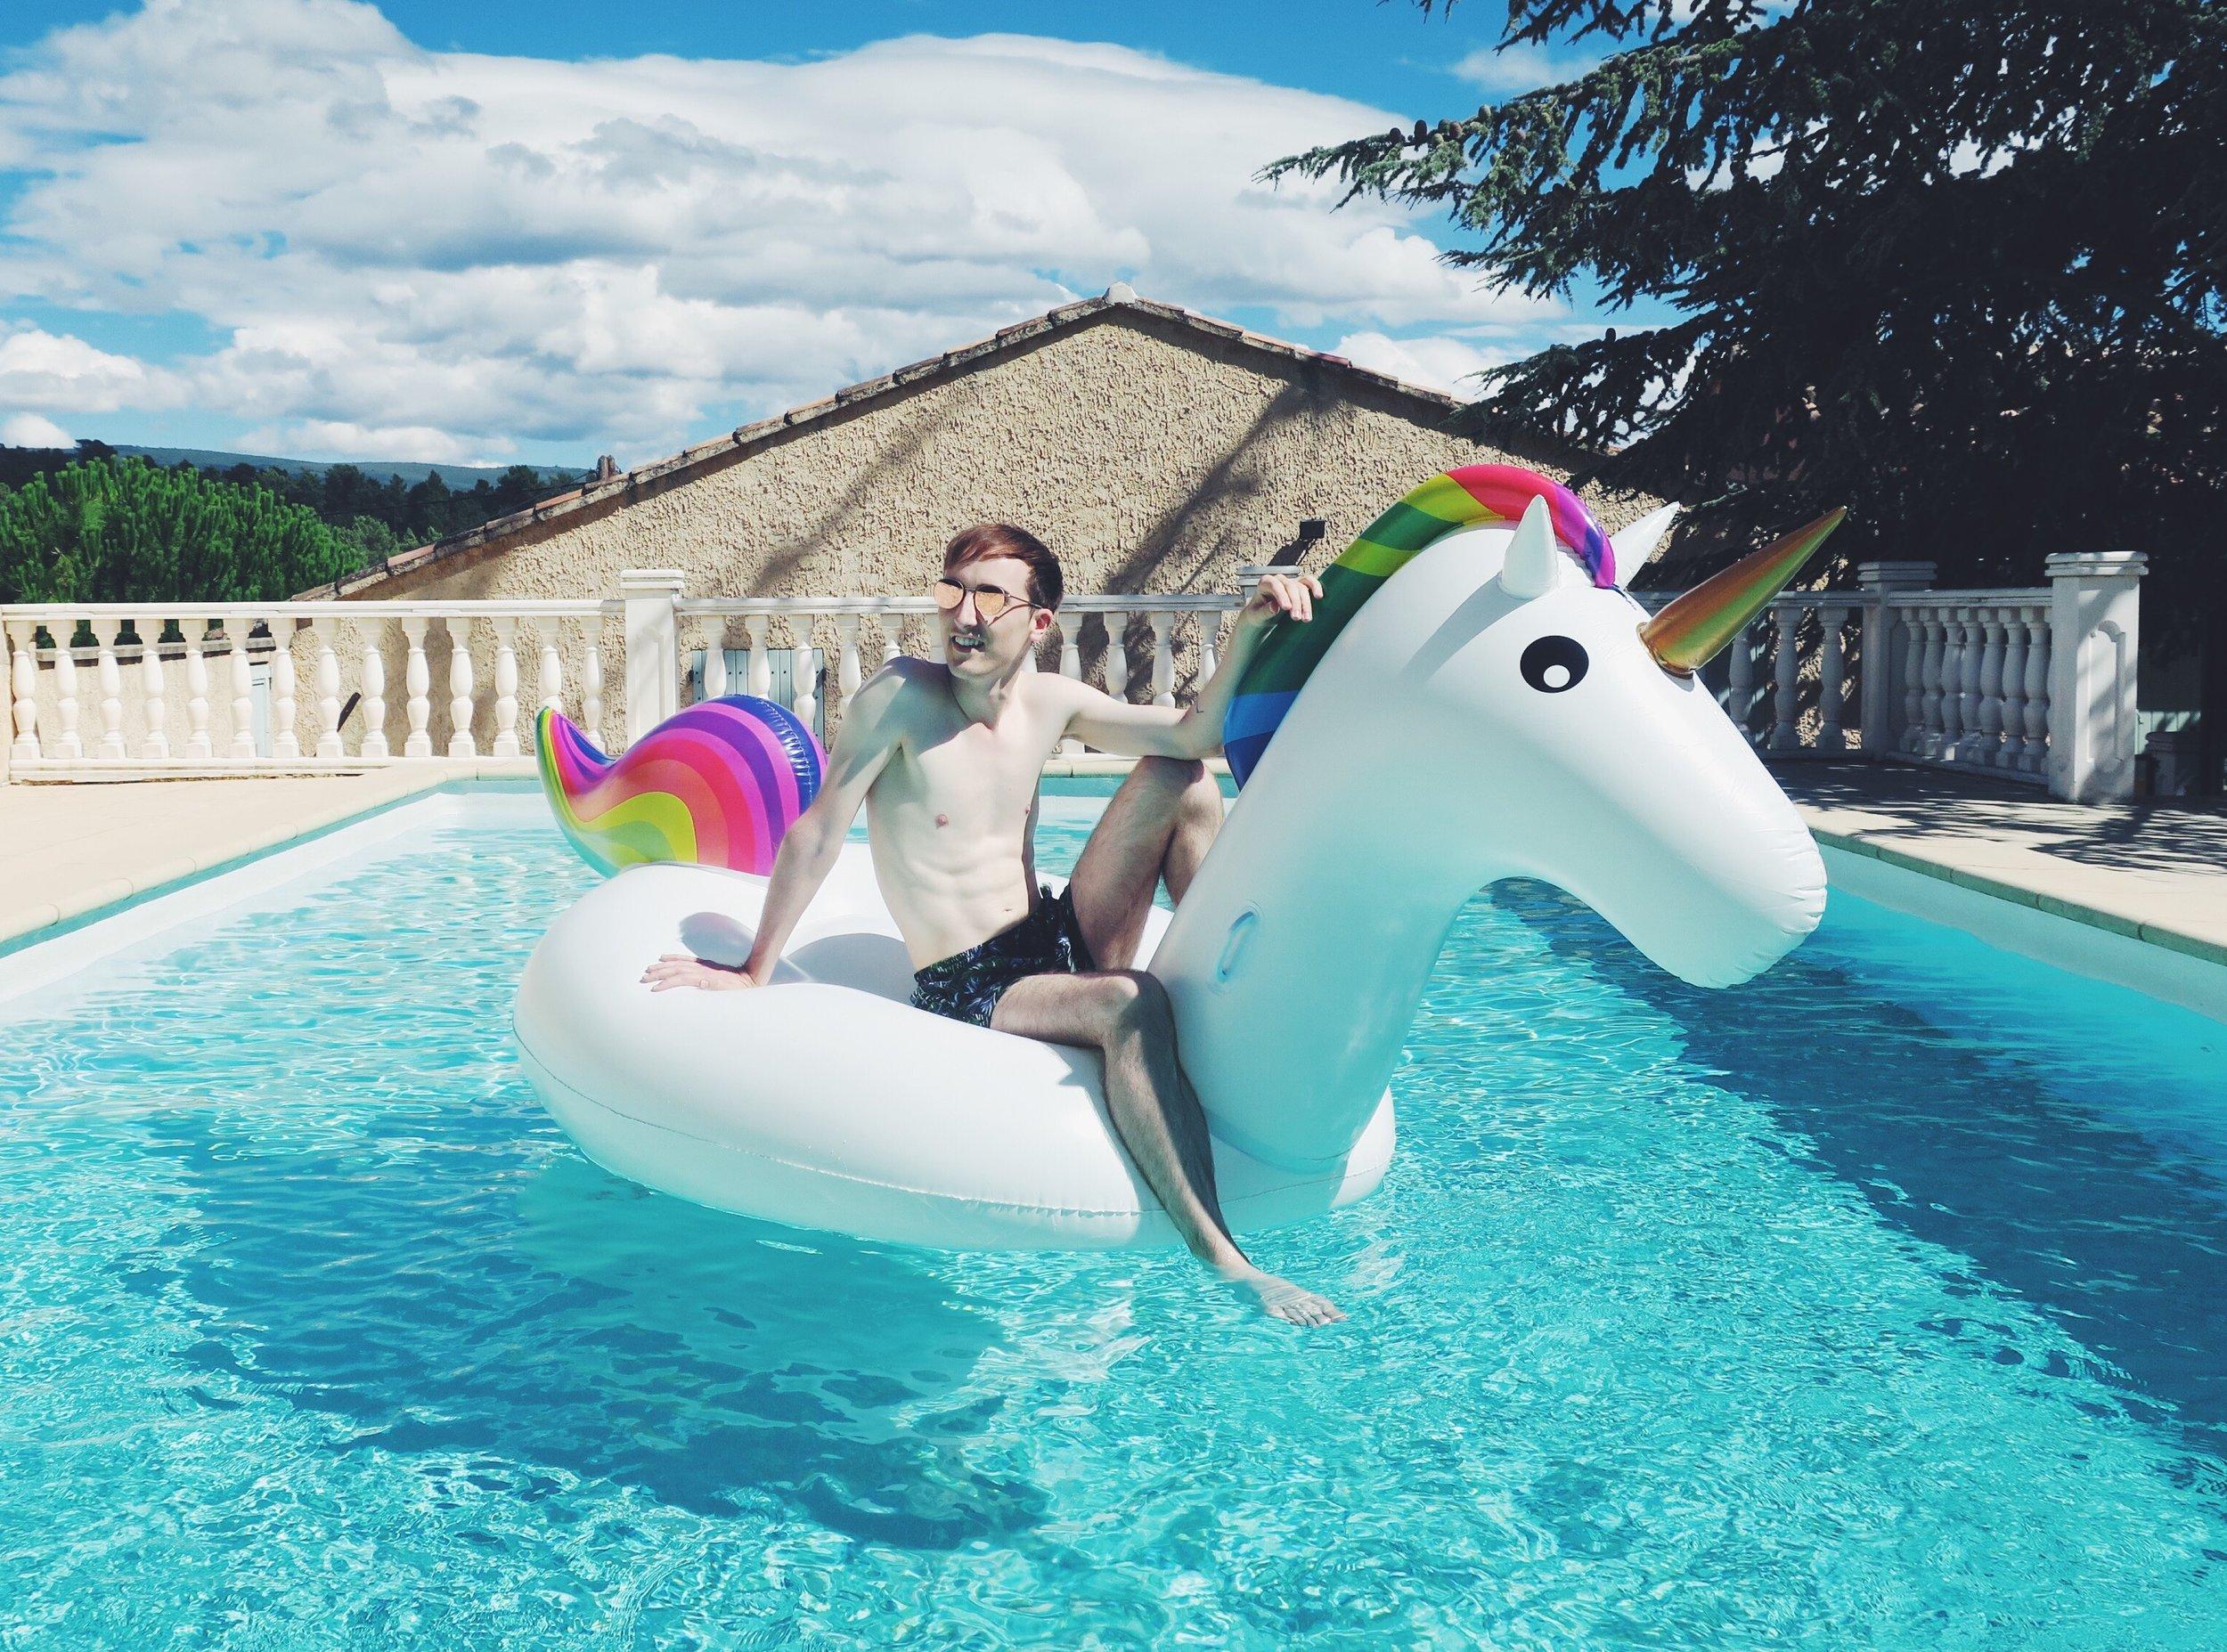 Komono sunglasses - H&M shorts - Inflatable unicorn via bol.com